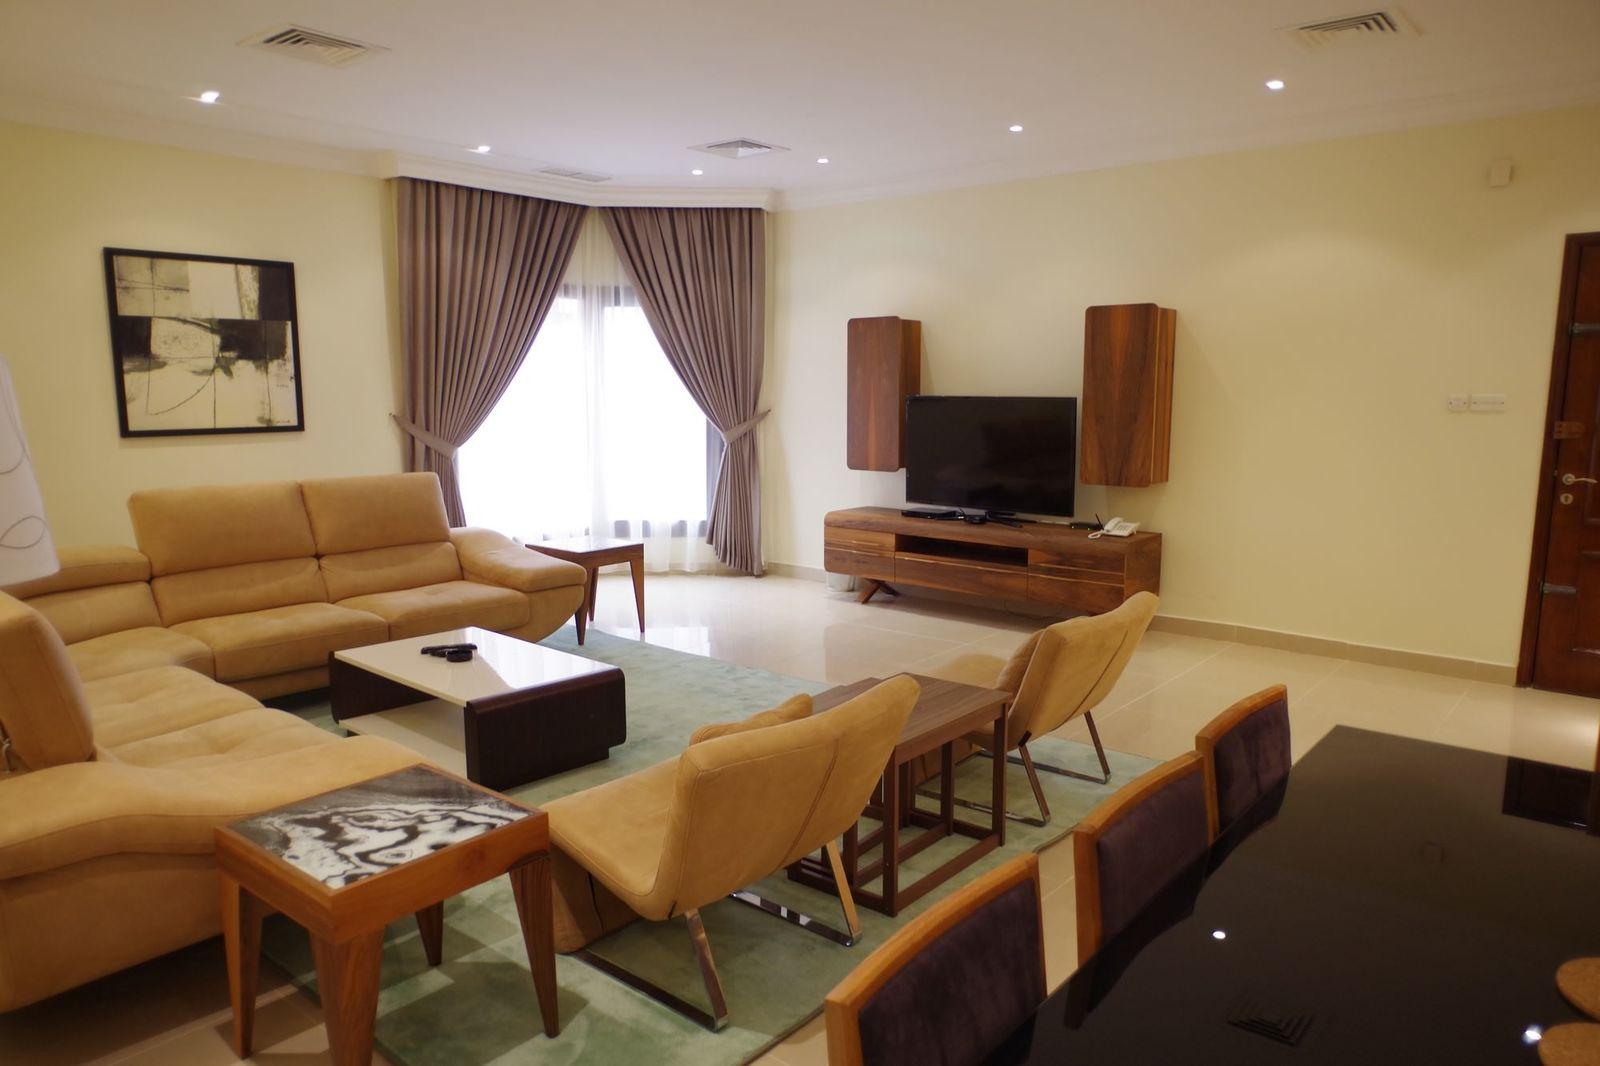 Salwa – large, furnished, three bedroom apartment w/pools